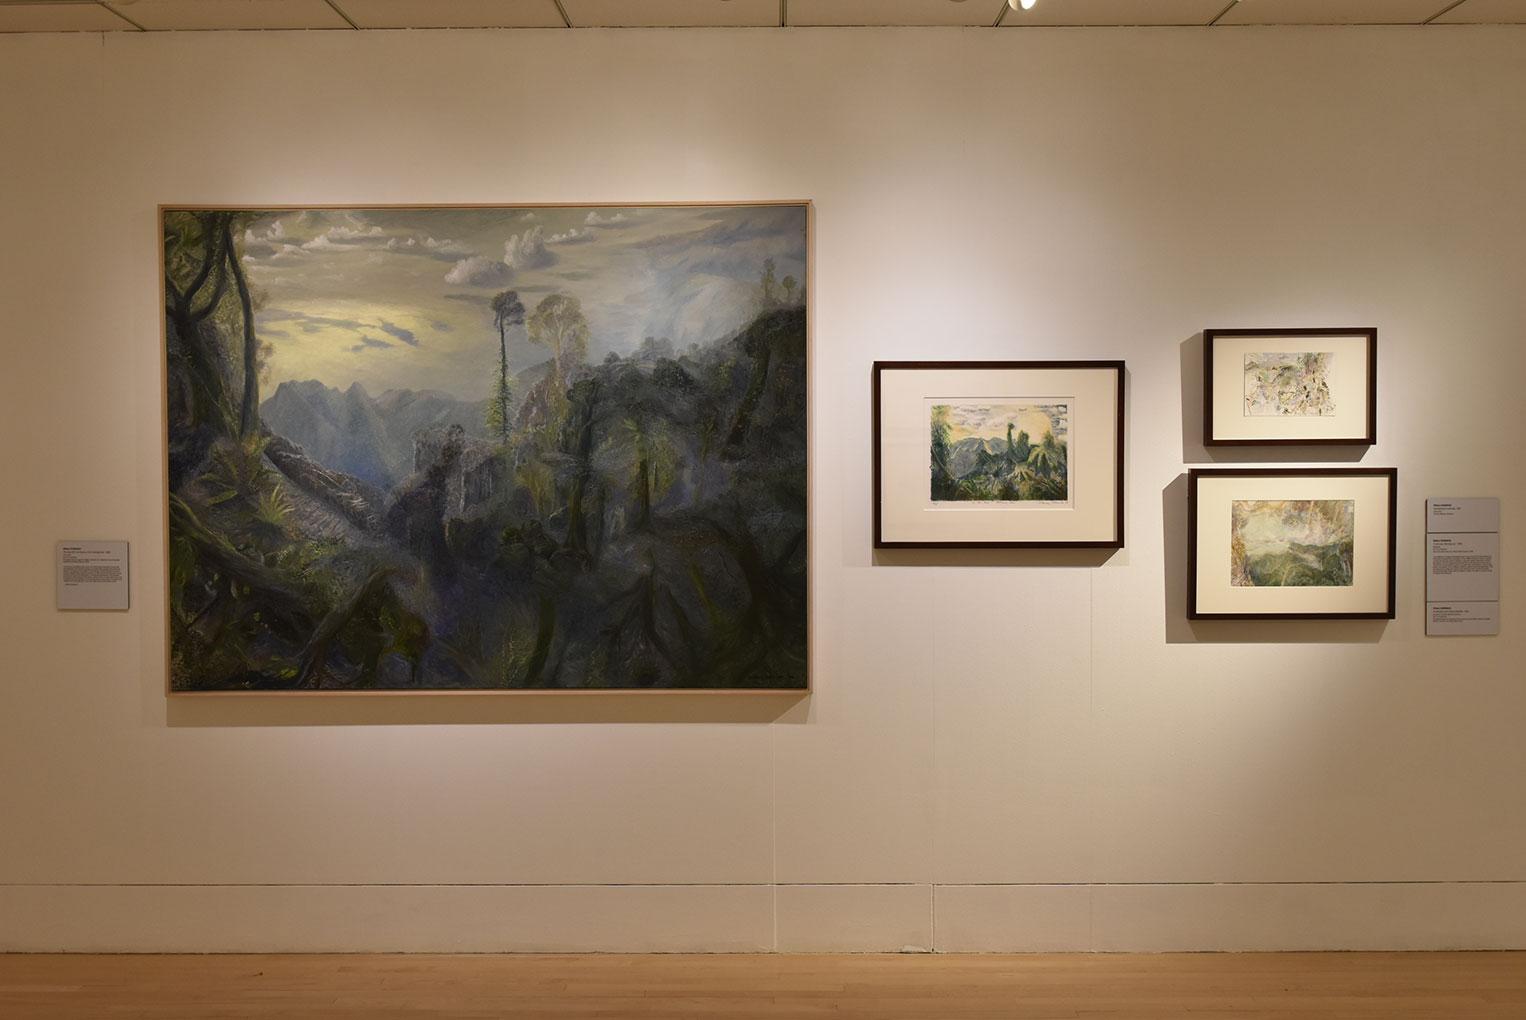 Installation view of 'William Robinson: Genesis' 2017, Embassy of Australia, Washington D.C.